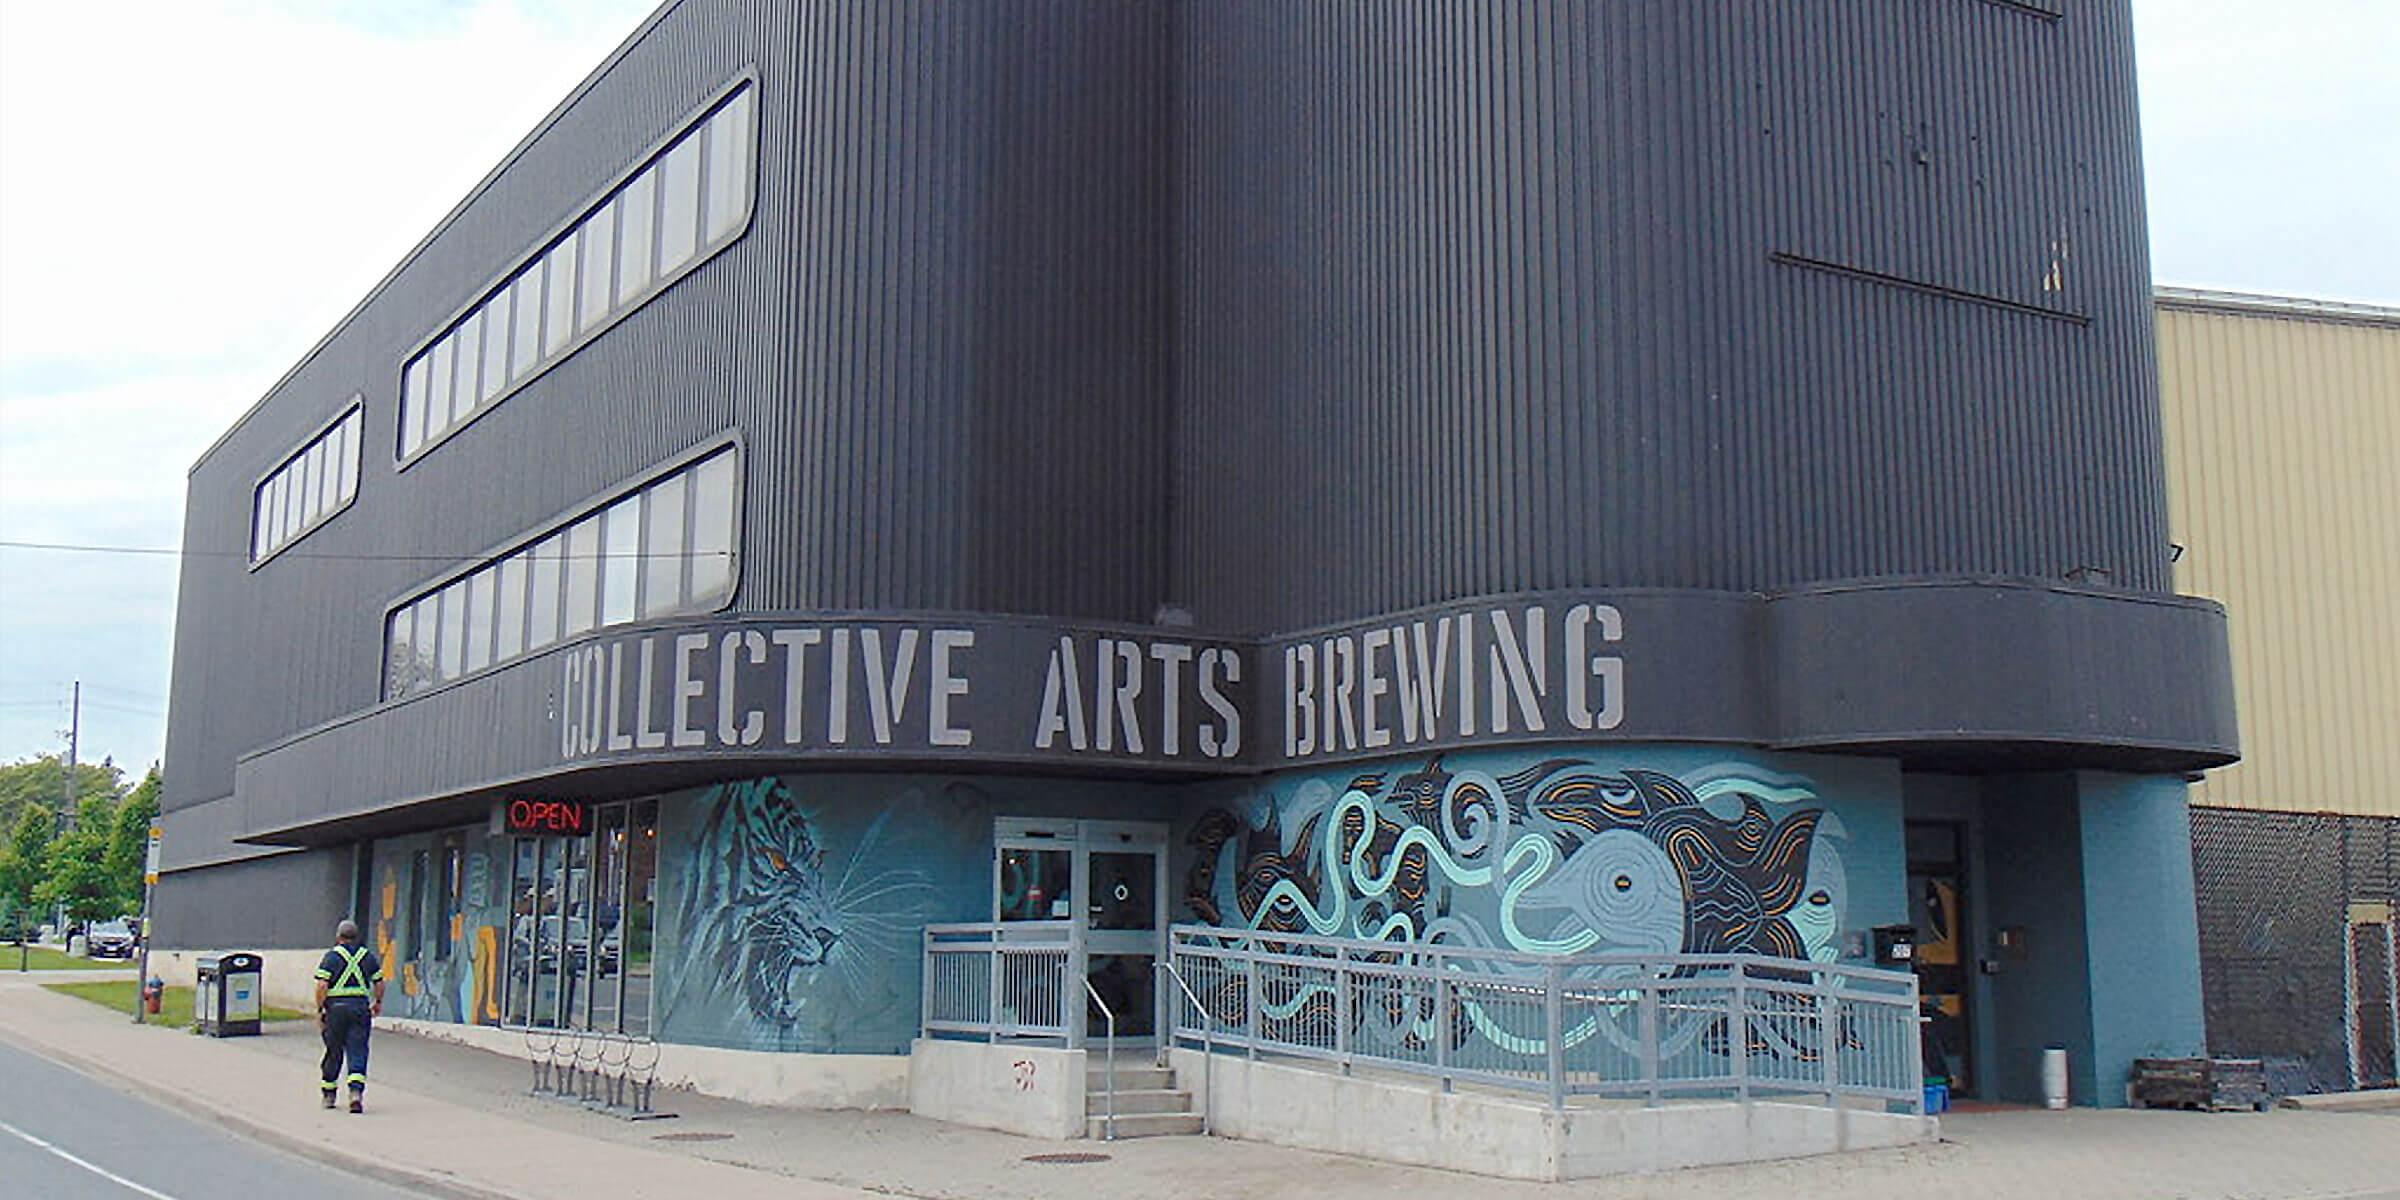 Outside the Collective Arts Brewing building in Hamilton, Ontario